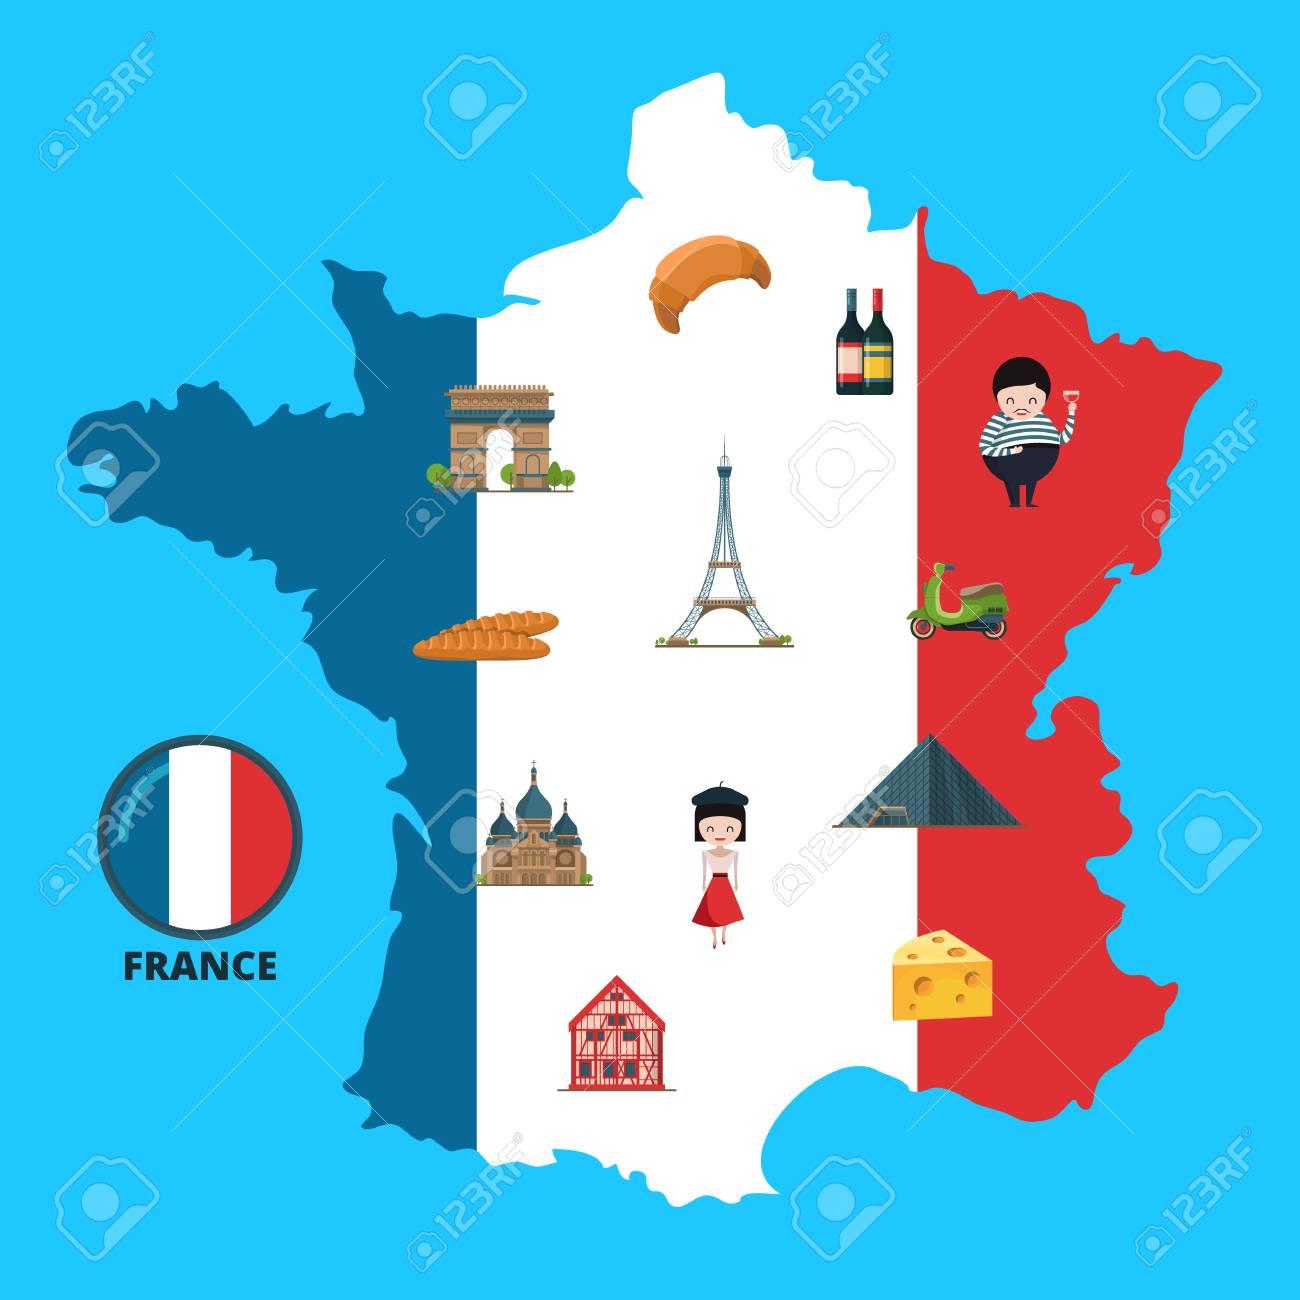 Map Of France Cartoon.Vector Cartoon France Sights On France Map Illustration Stock Photo